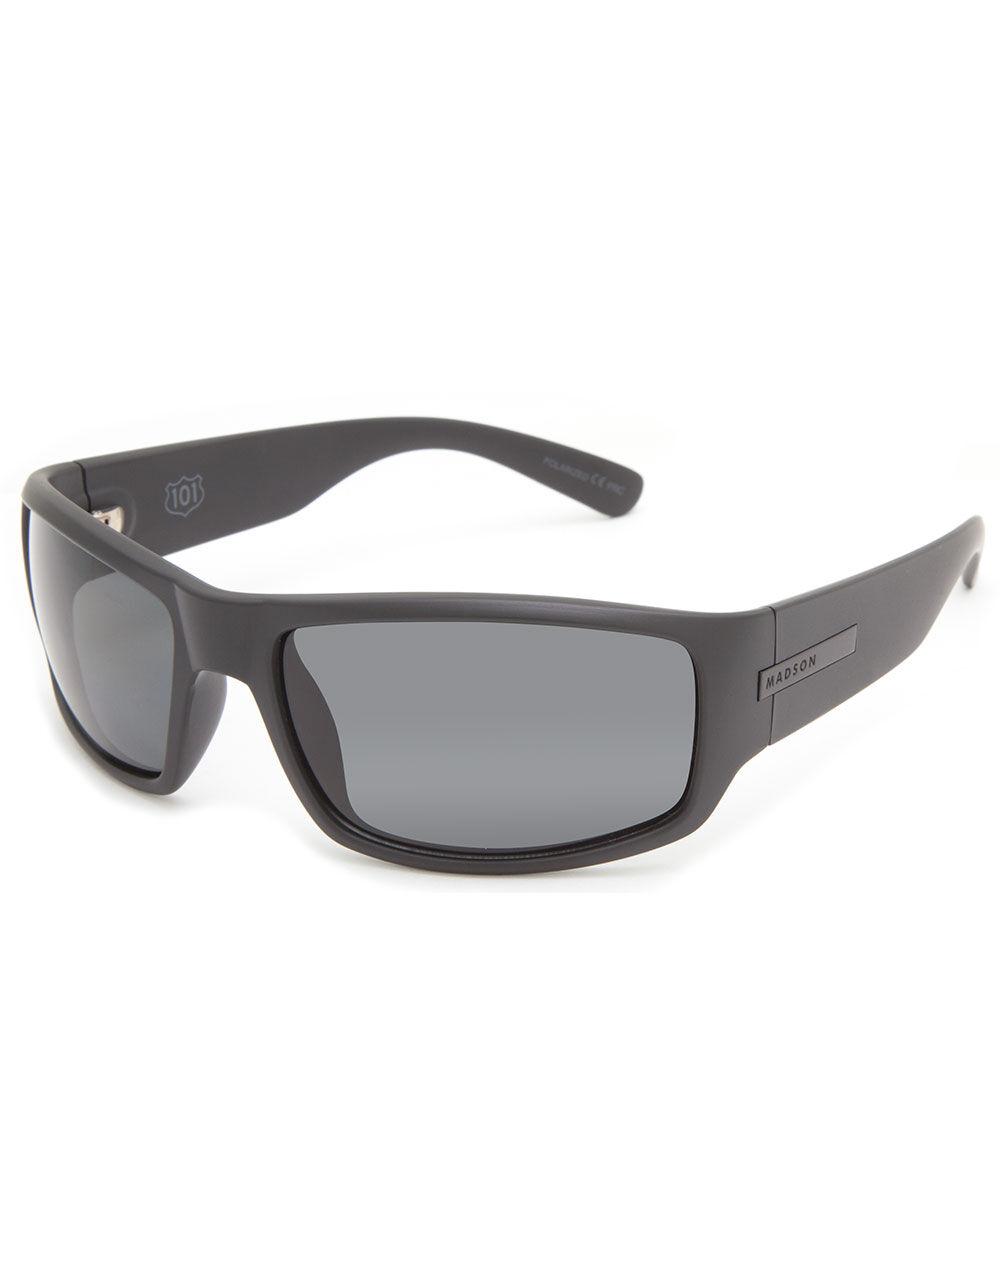 MADSON 101 Polarized Sunglasses